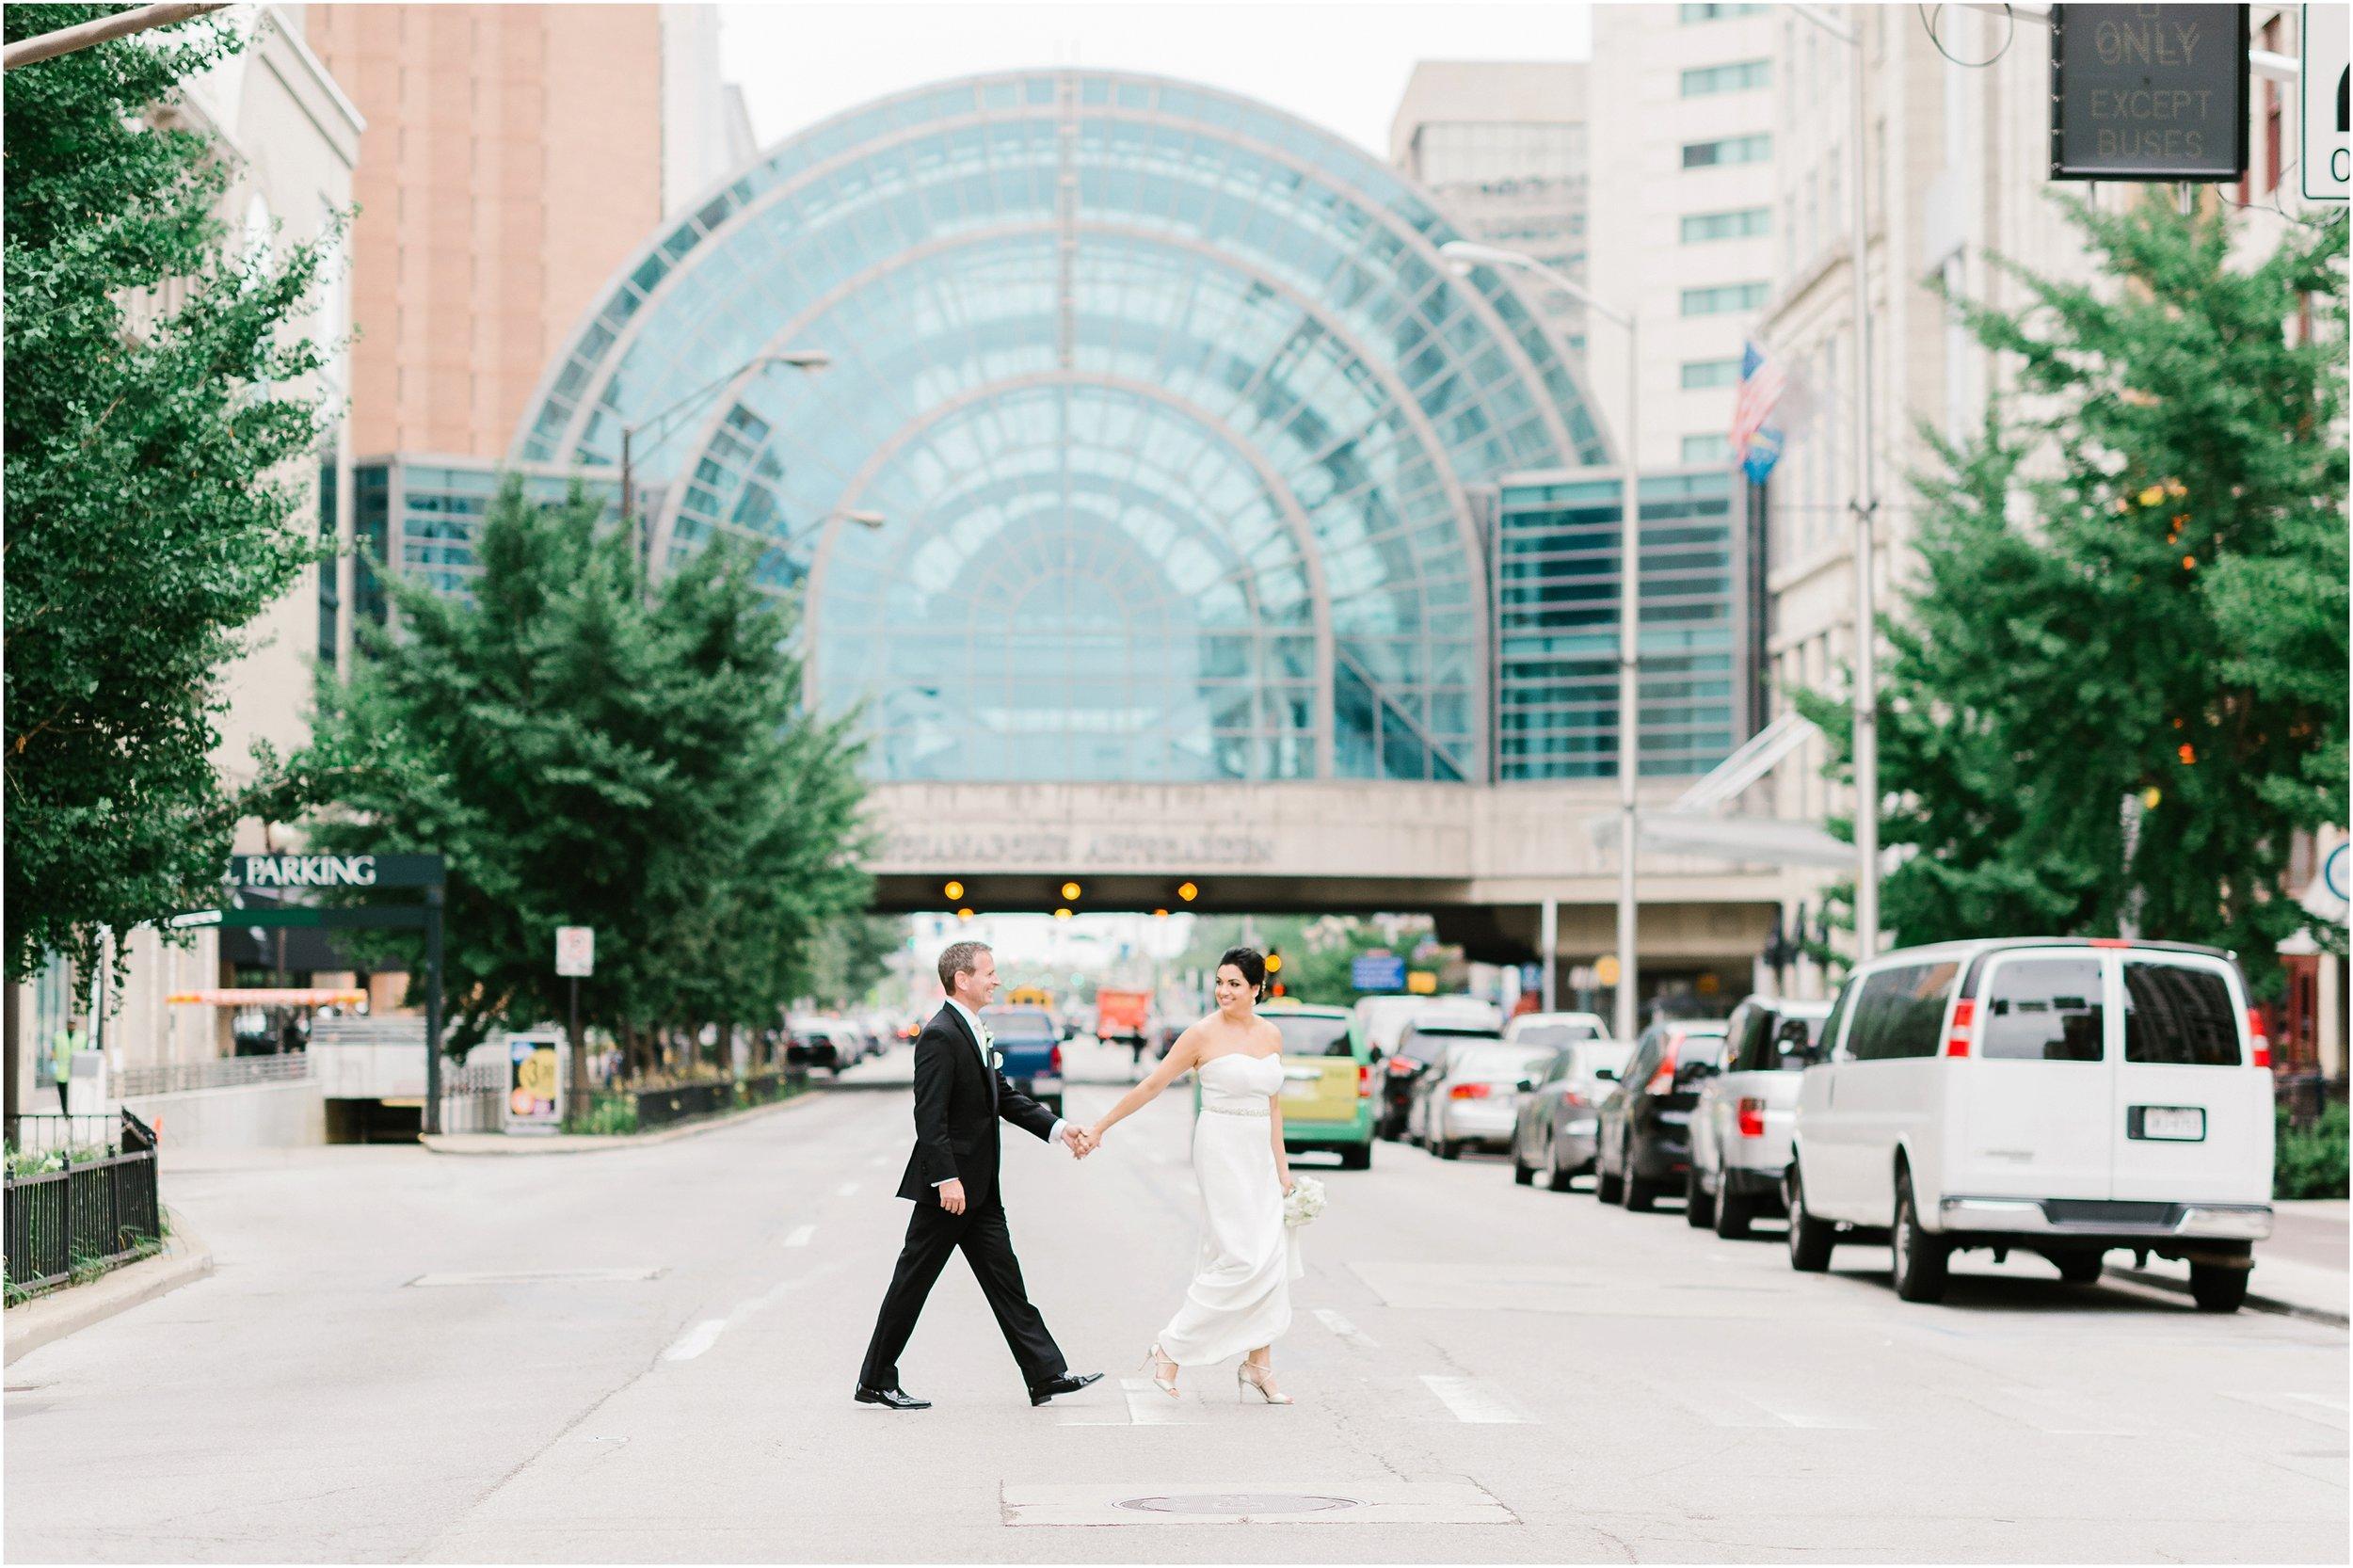 Rebecca_Shehorn_Photography_Indianapolis_Wedding_Photographer_8563.jpg